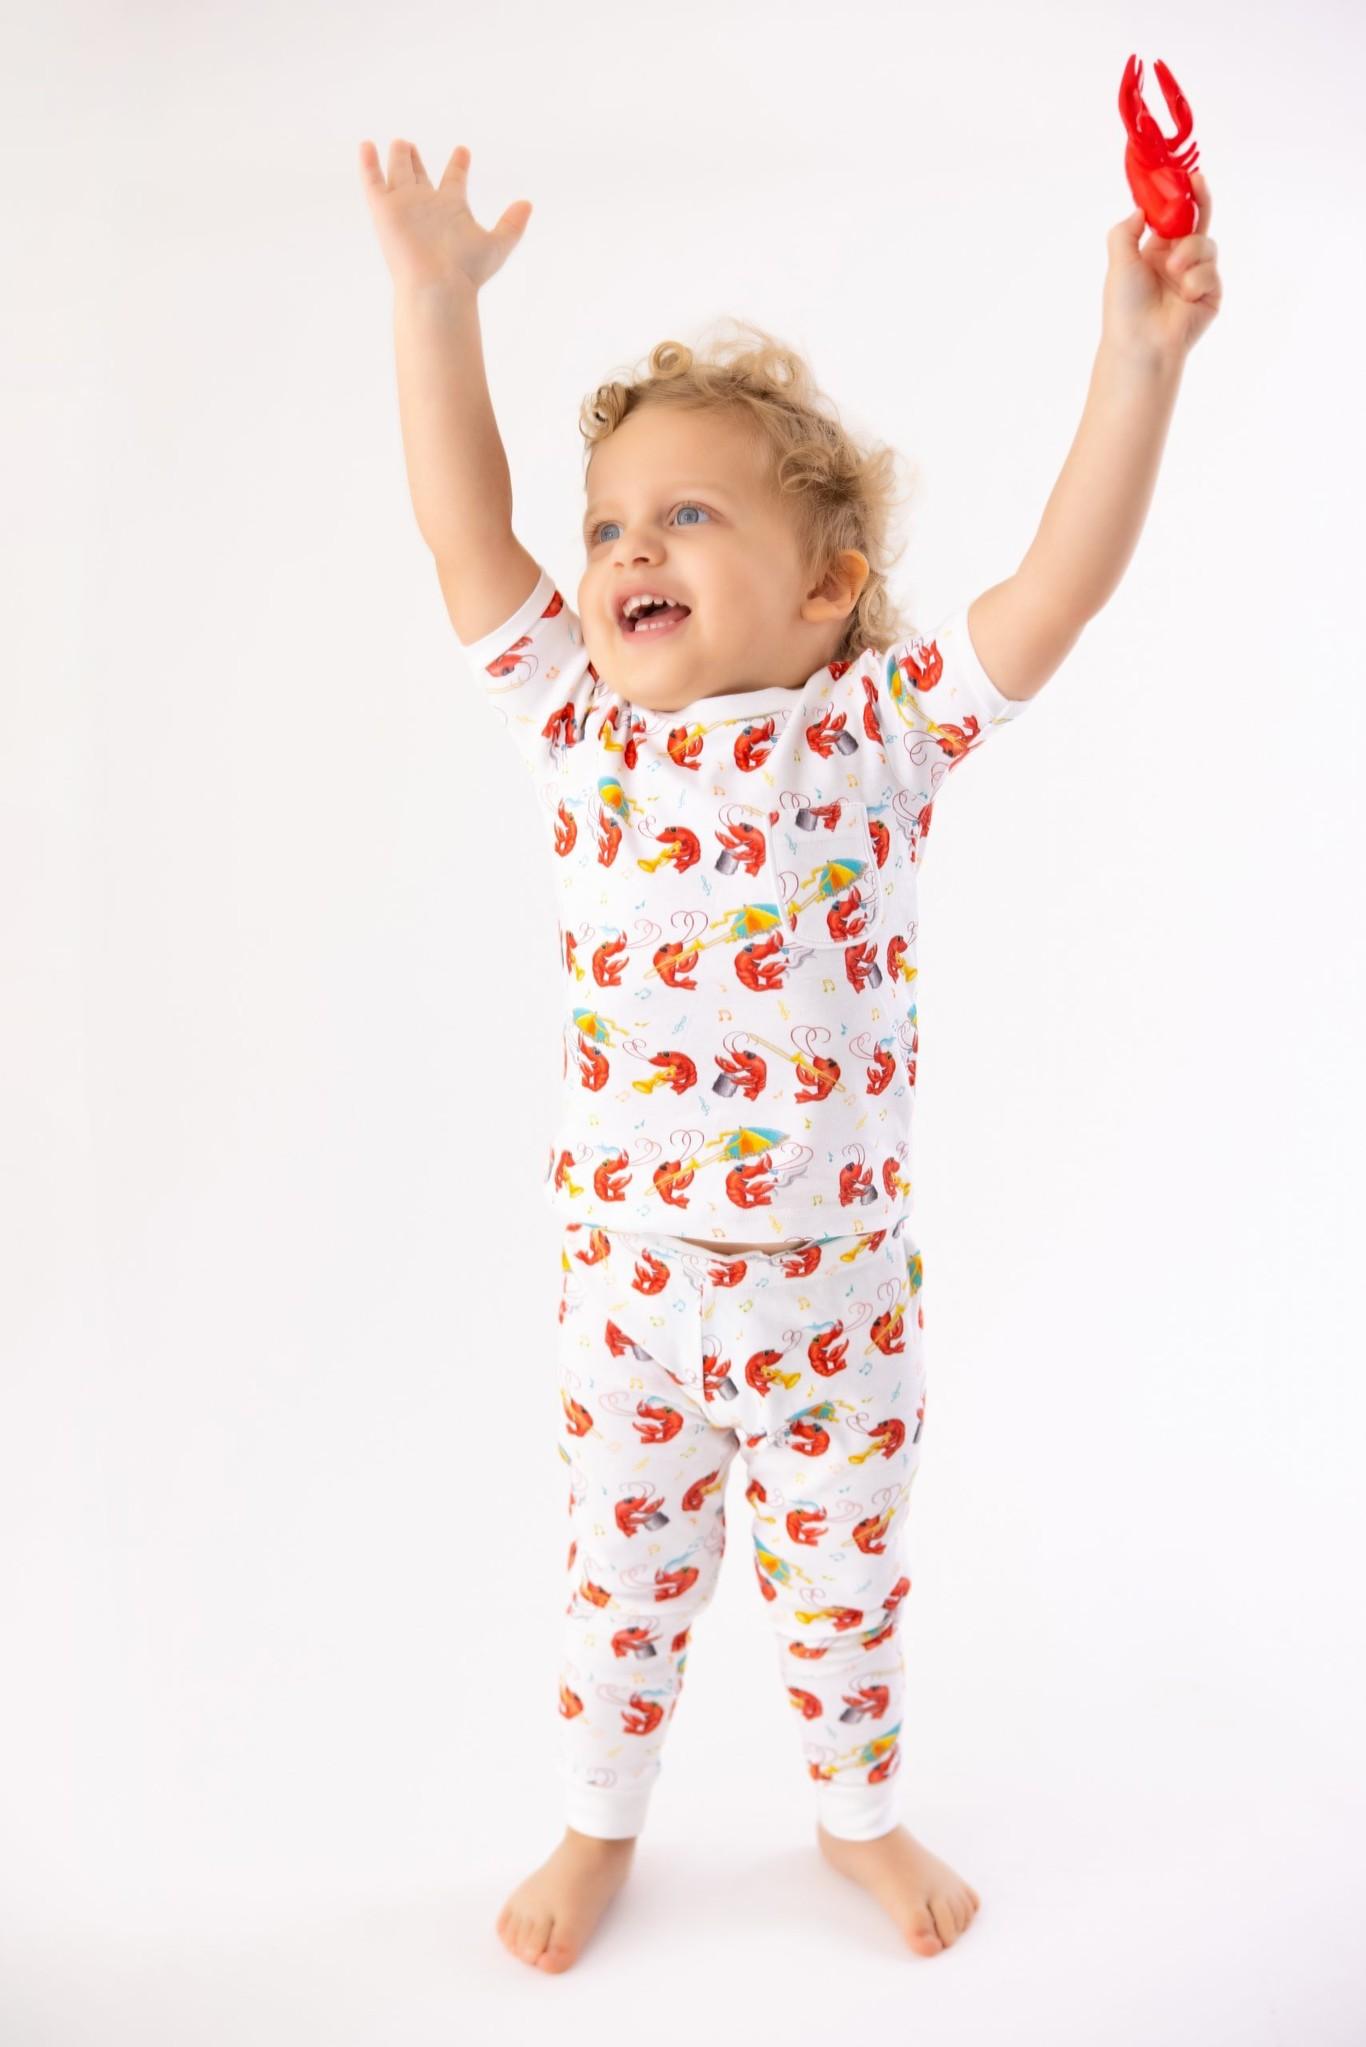 Nola Tawk Crawfish Second Line Organic Cotton Pajamas